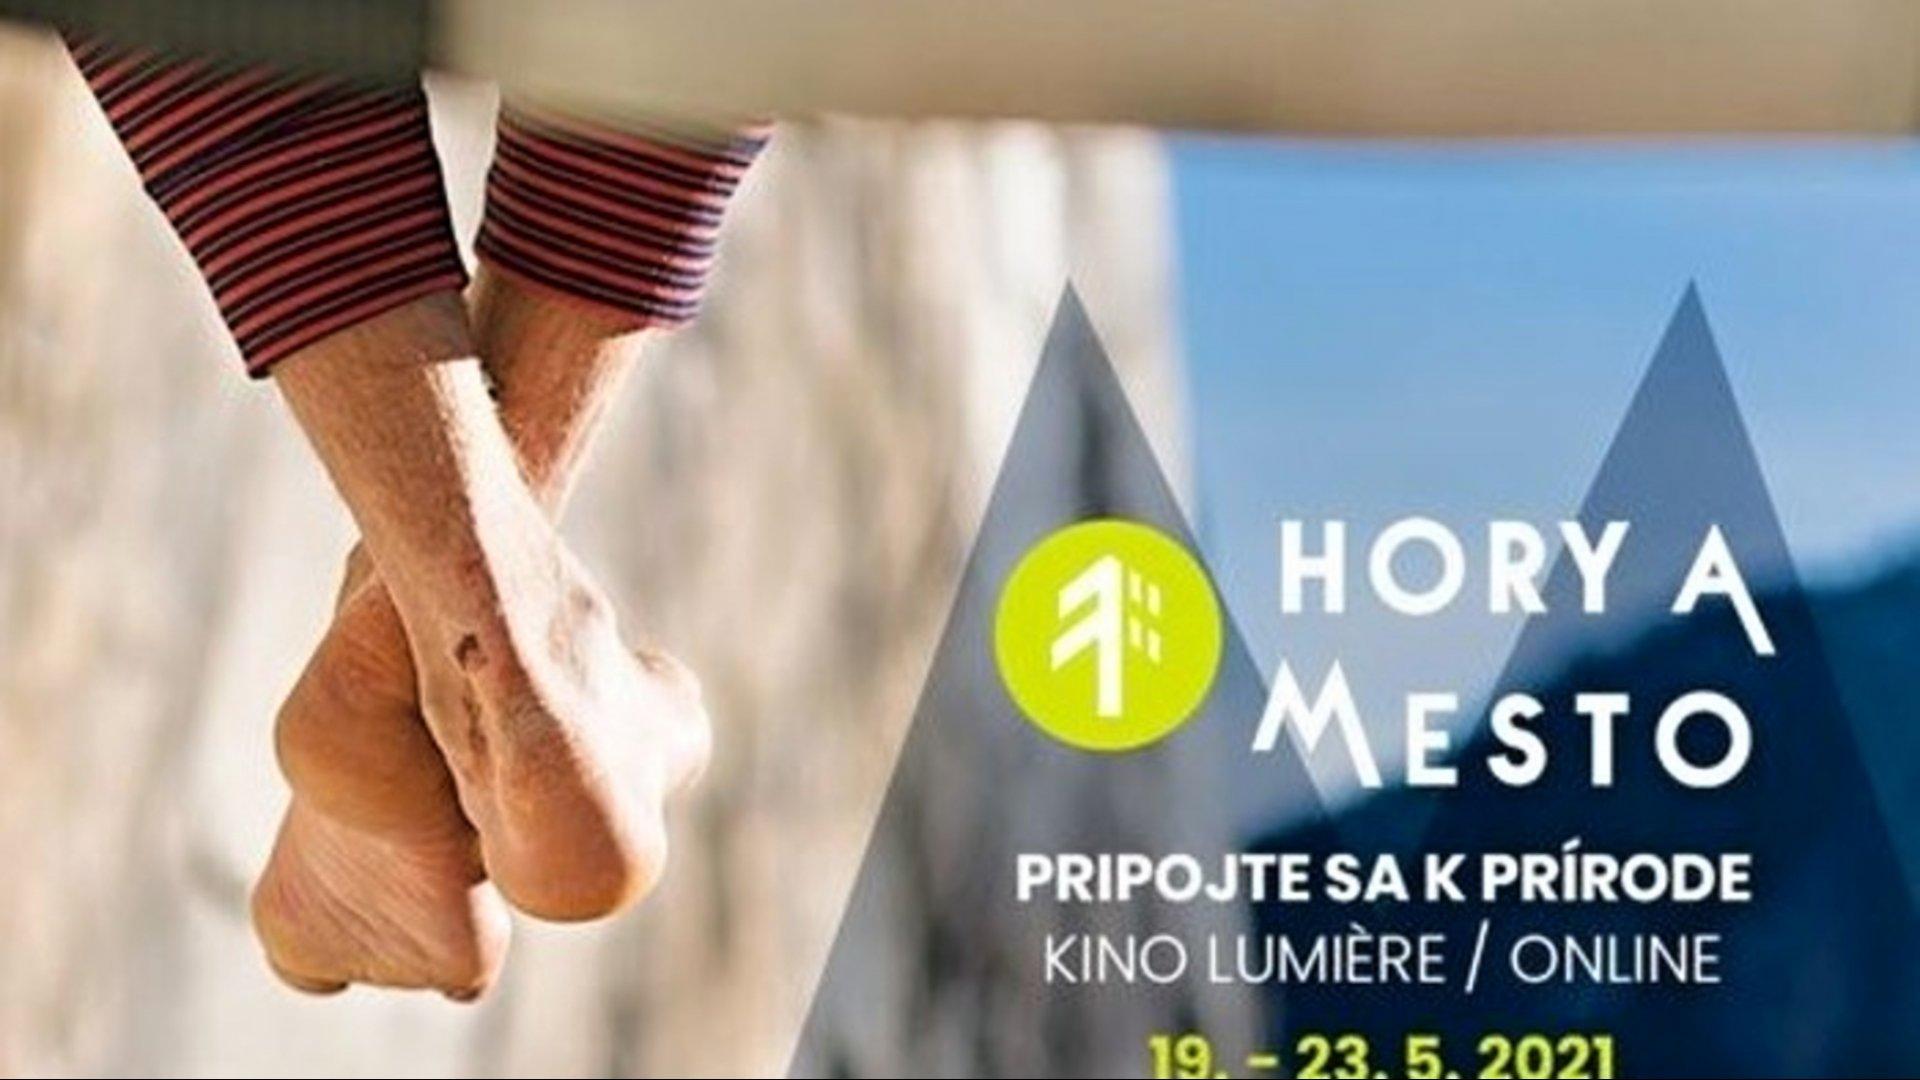 VYSOKÉ HORY 1 | HORY A MESTO / kinodoma online